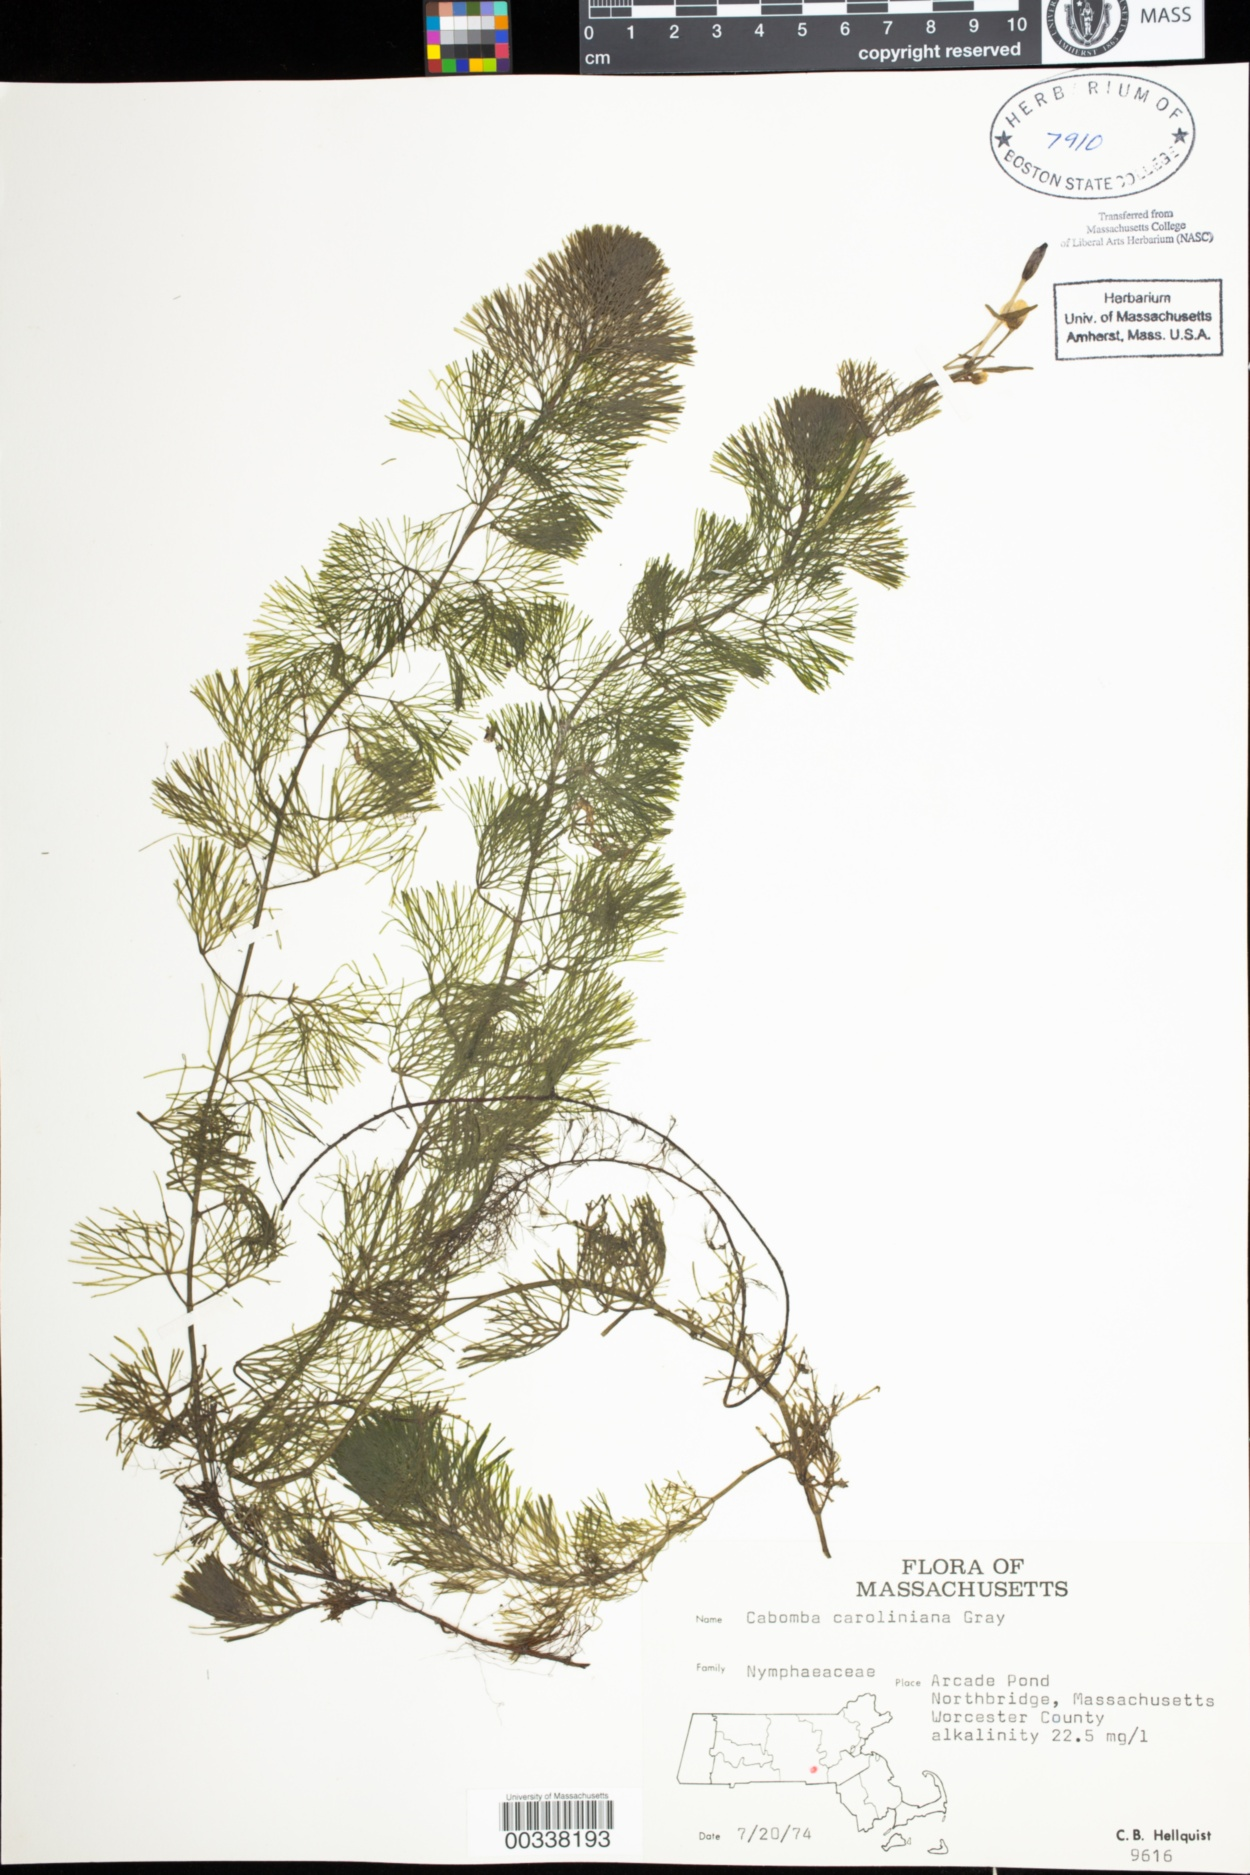 Cabombaceae image